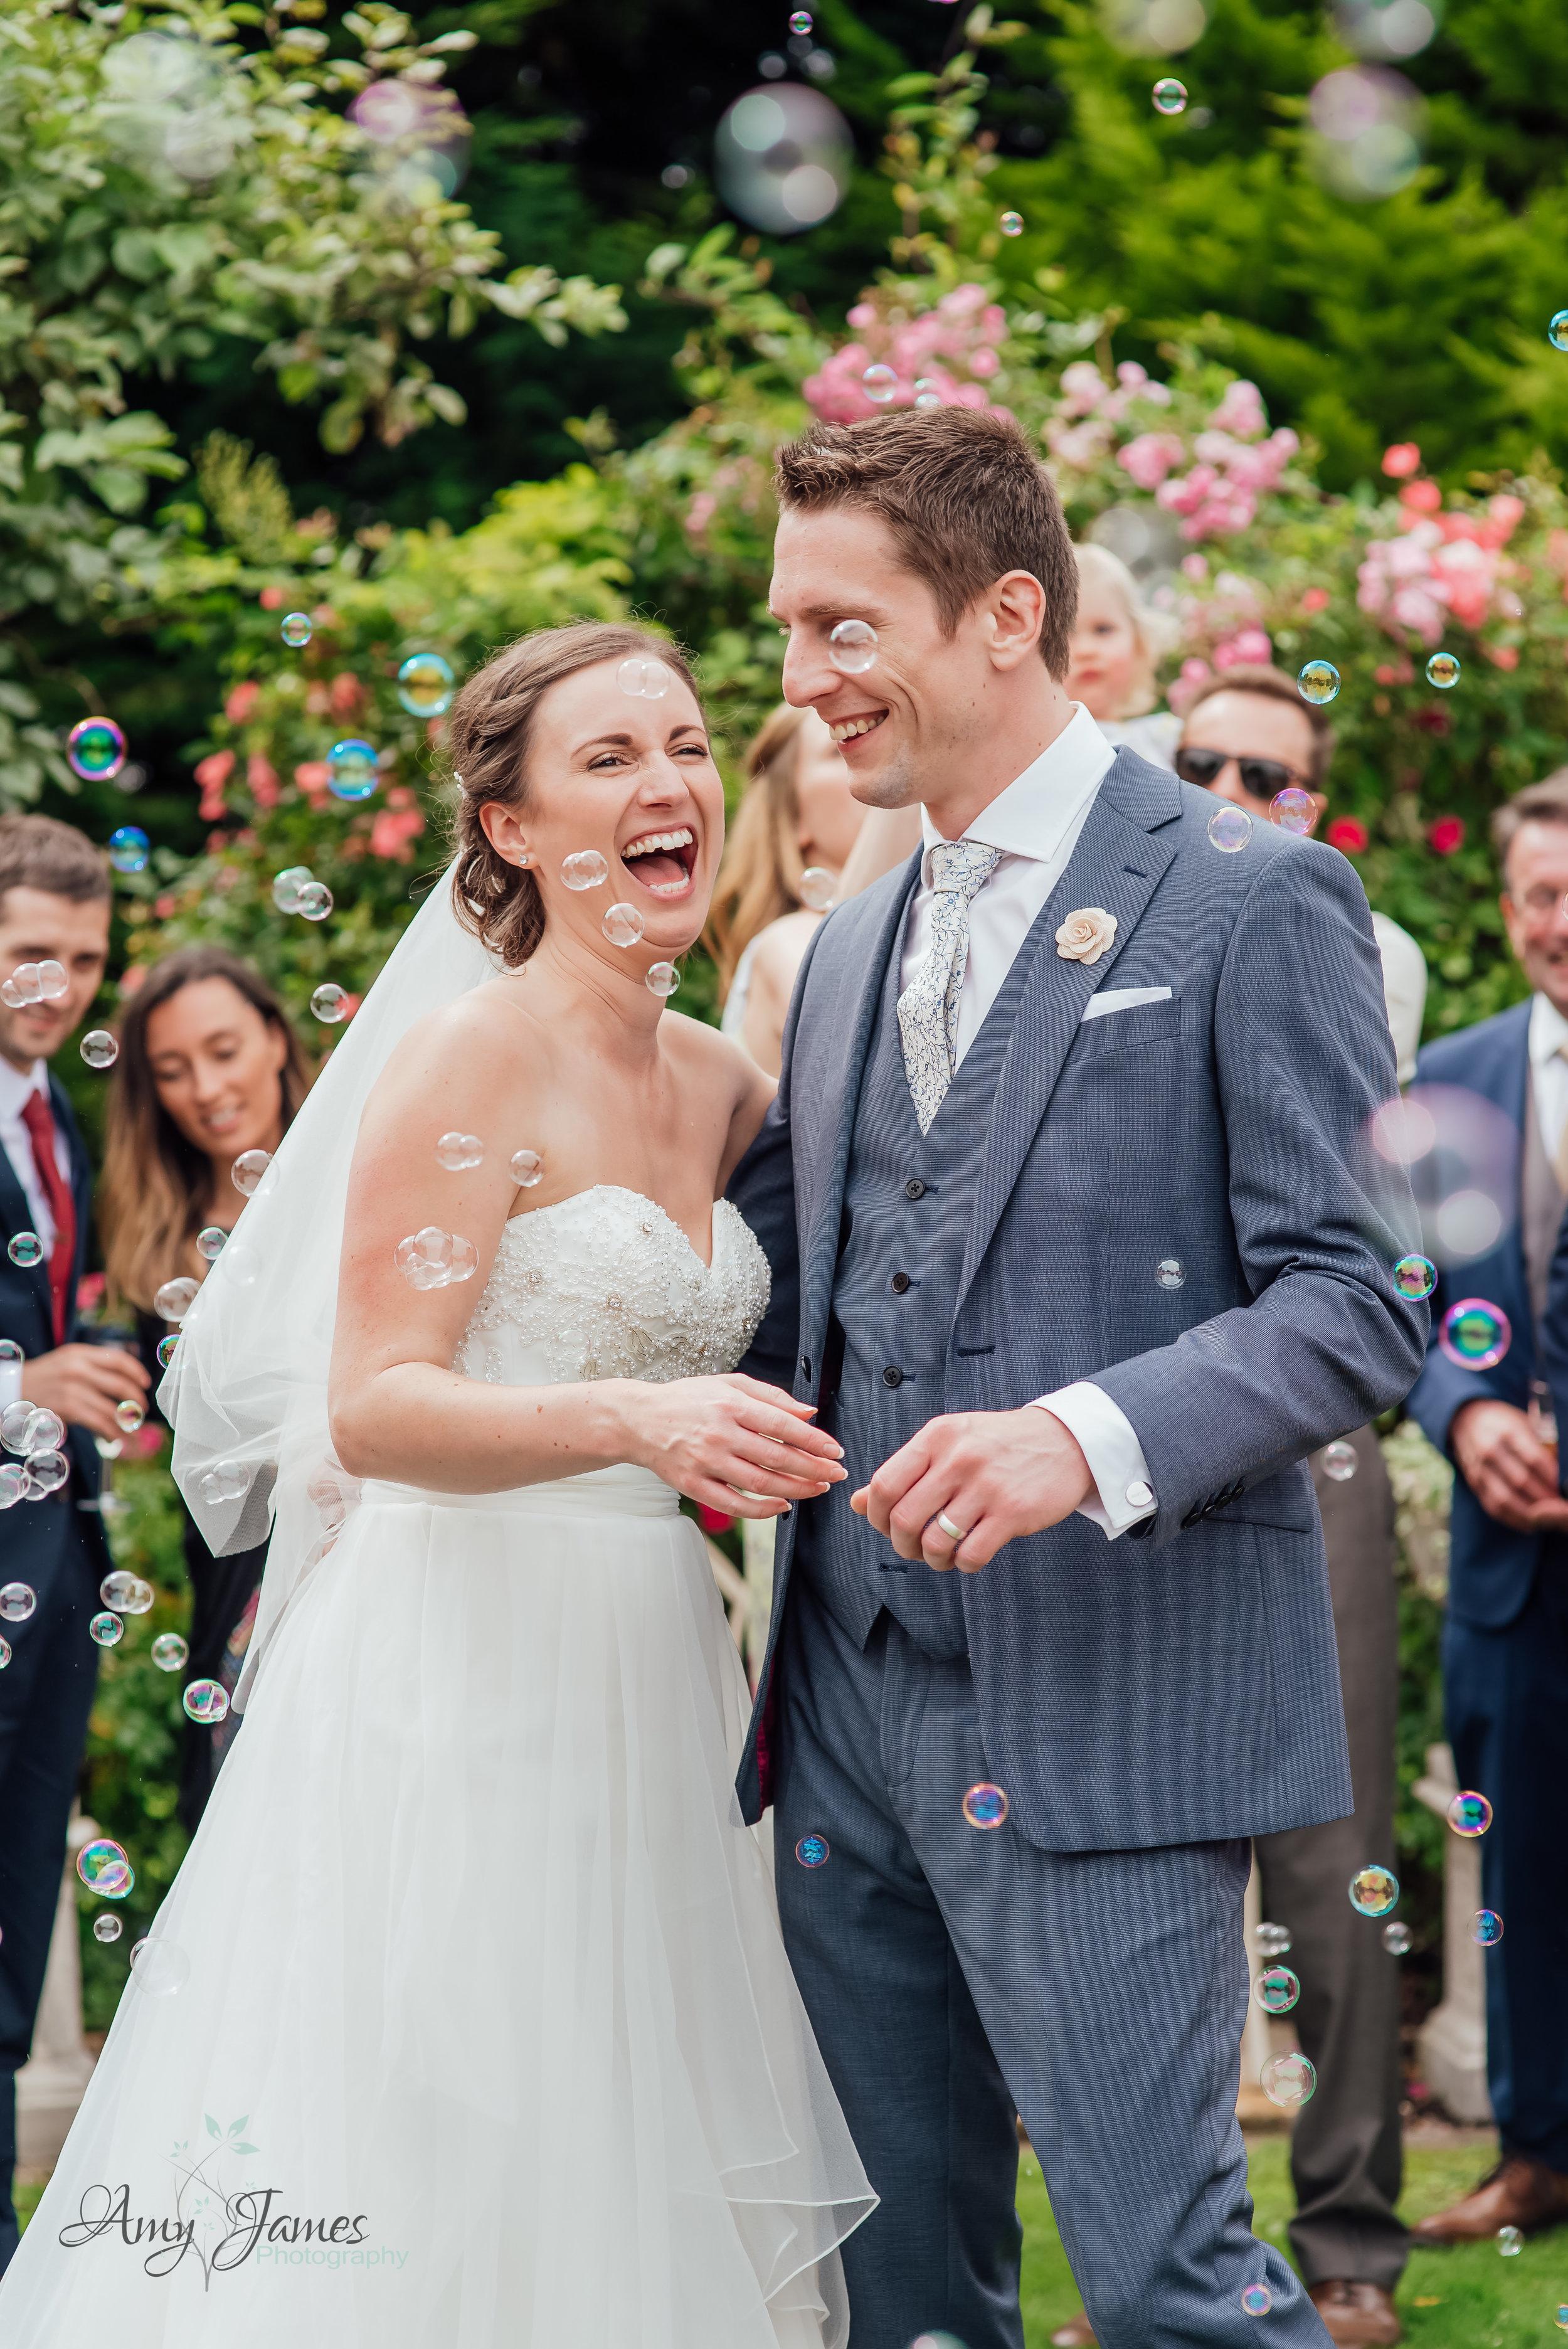 Bubble confetti at outside wedding venue Hampshire - Amy James Photography Hampshire Wedding Photographer